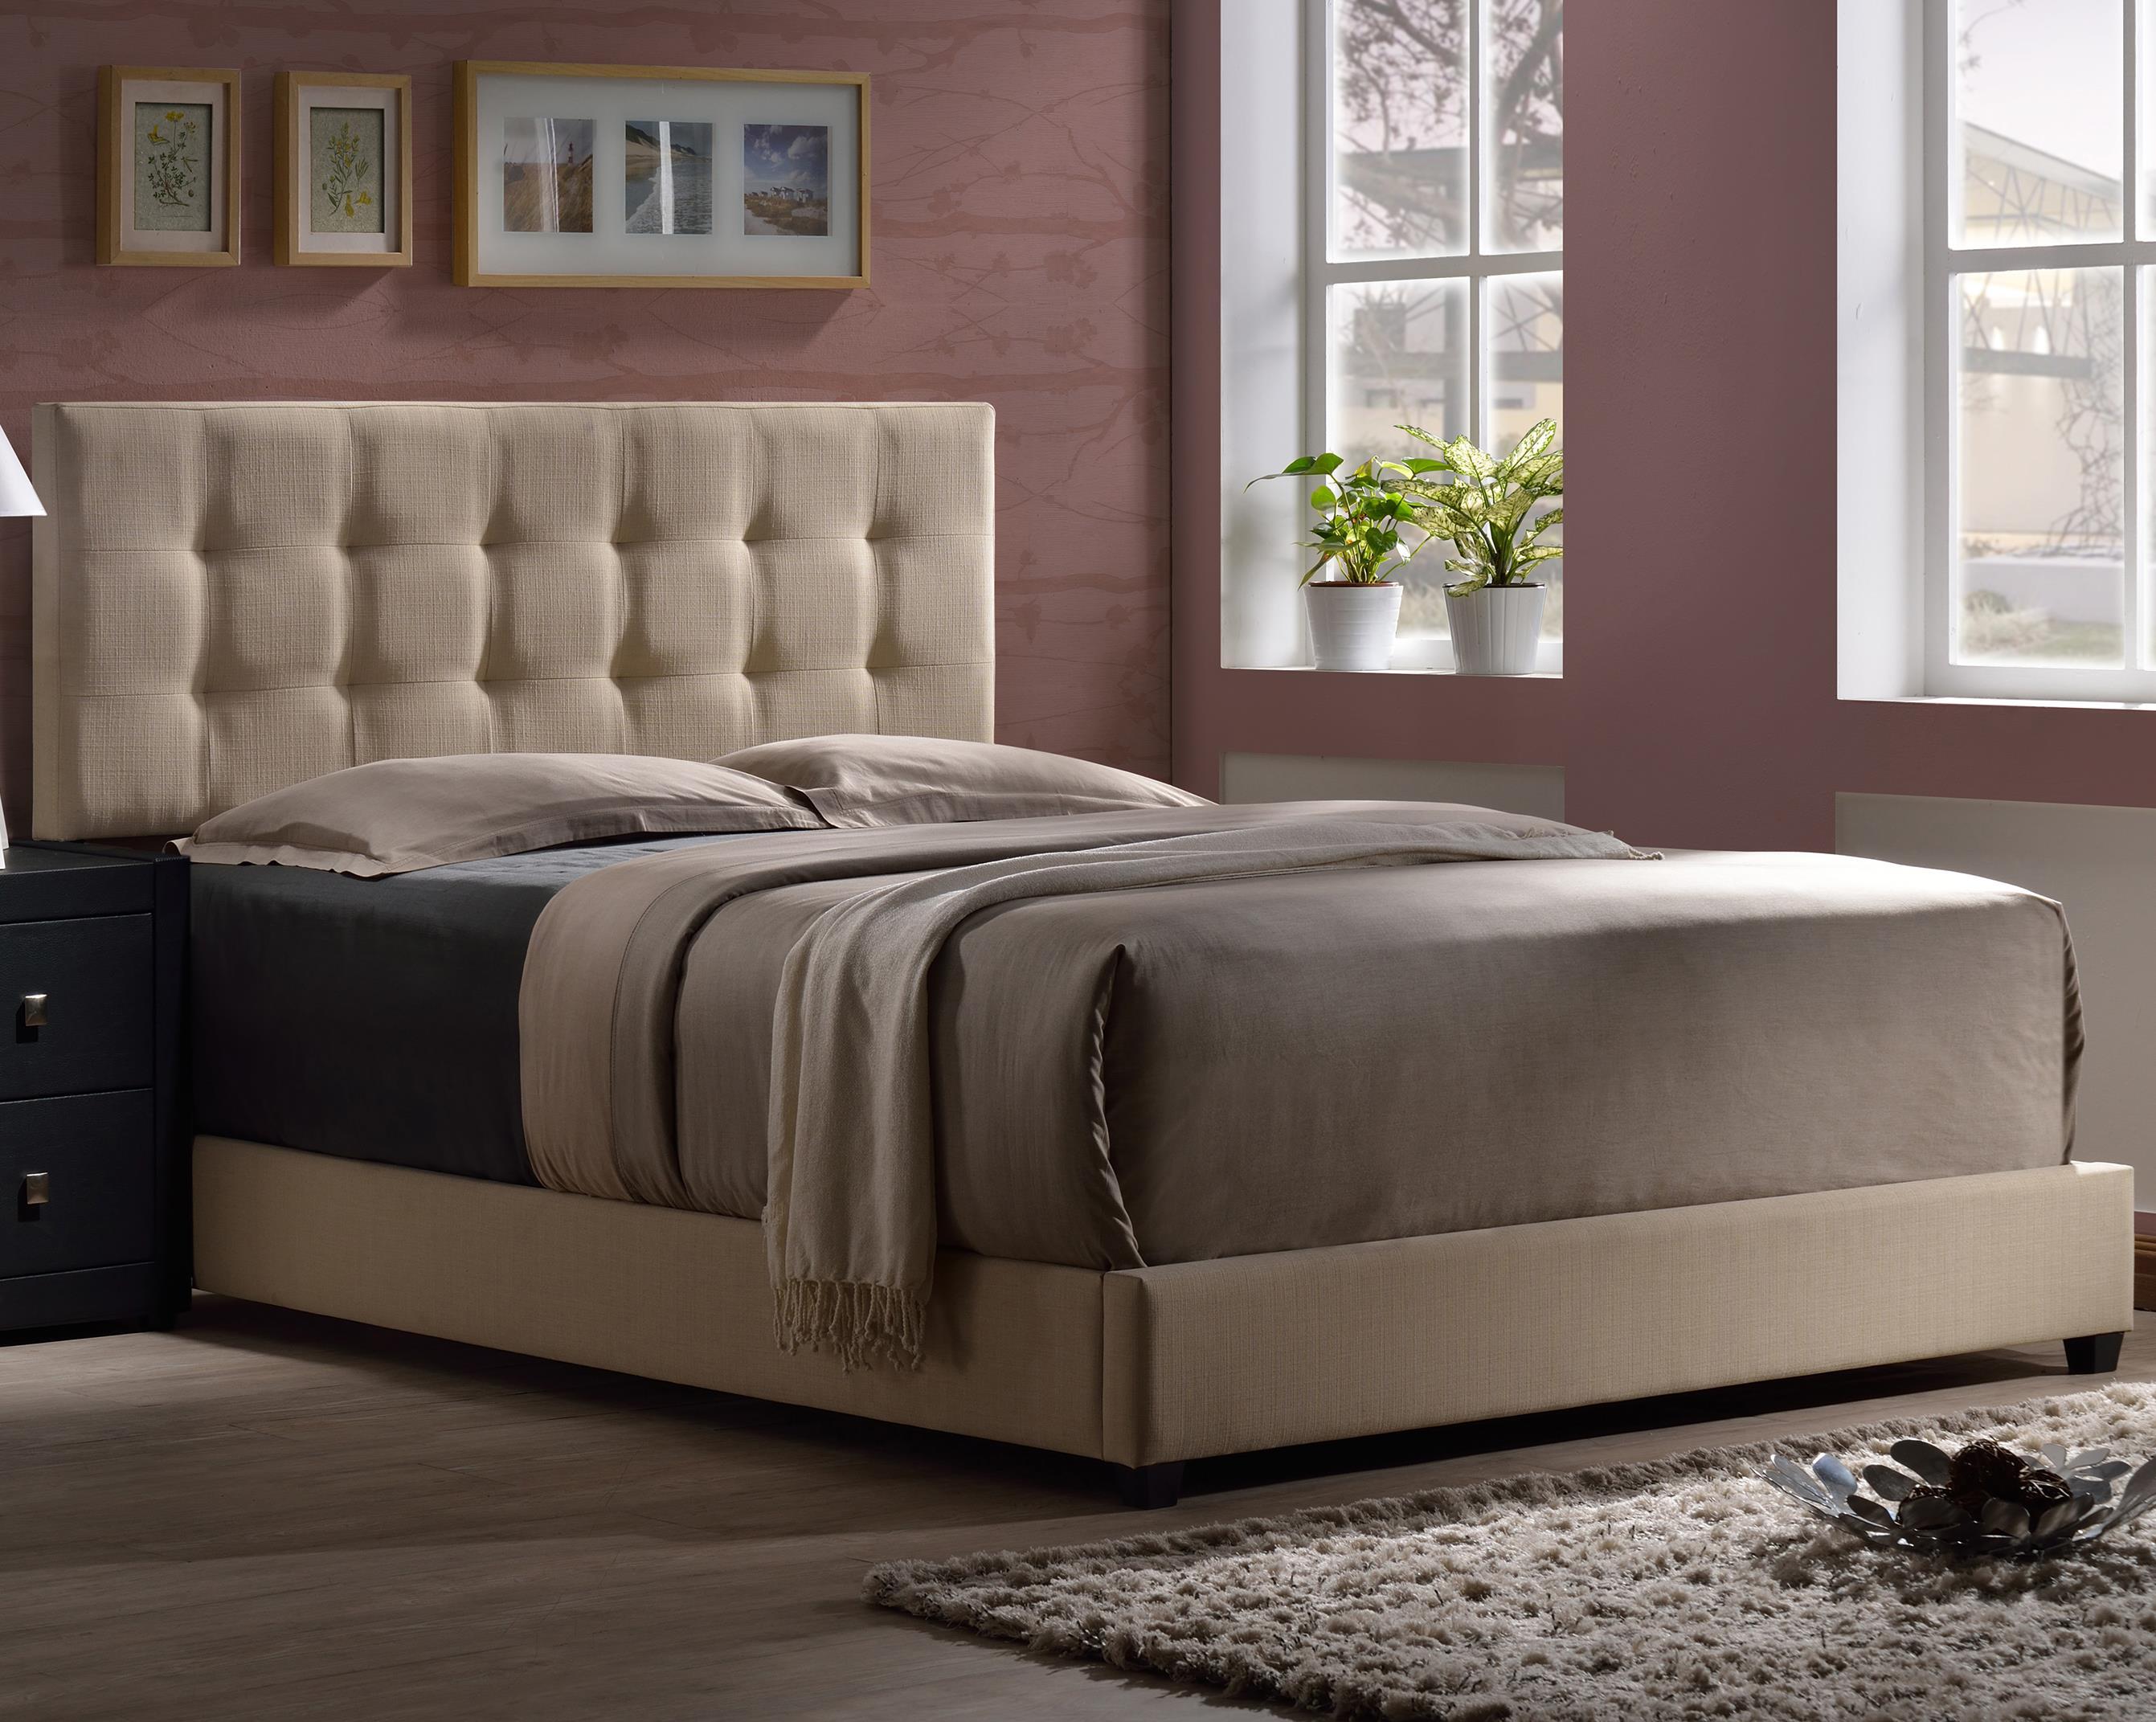 Hillsdale Duggan Twin Bed - Item Number: 1284BTWR